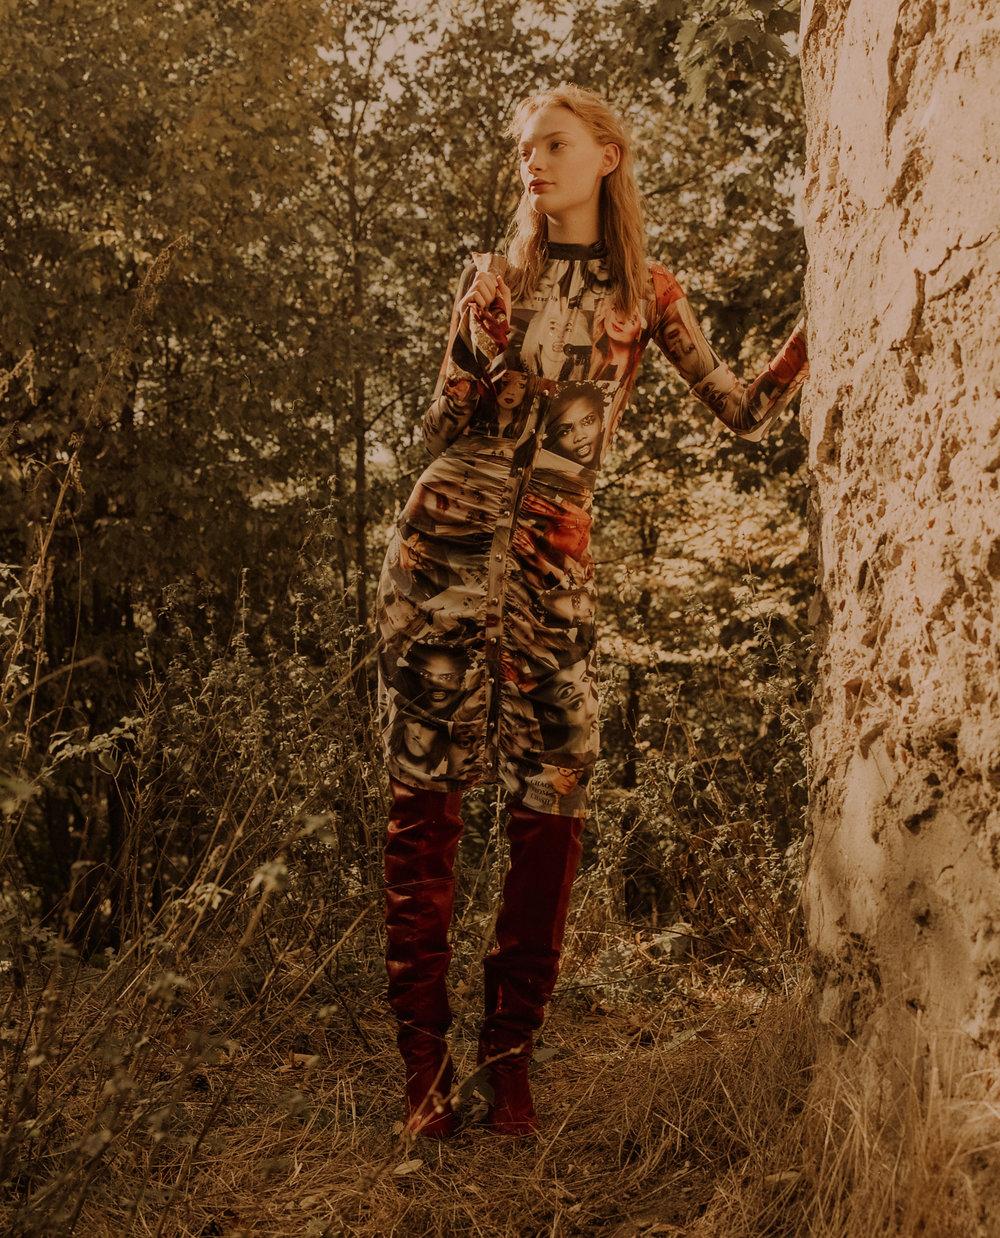 The Dress of My Dream by Photographer Lucas Lehmann on Anniversary Magazine